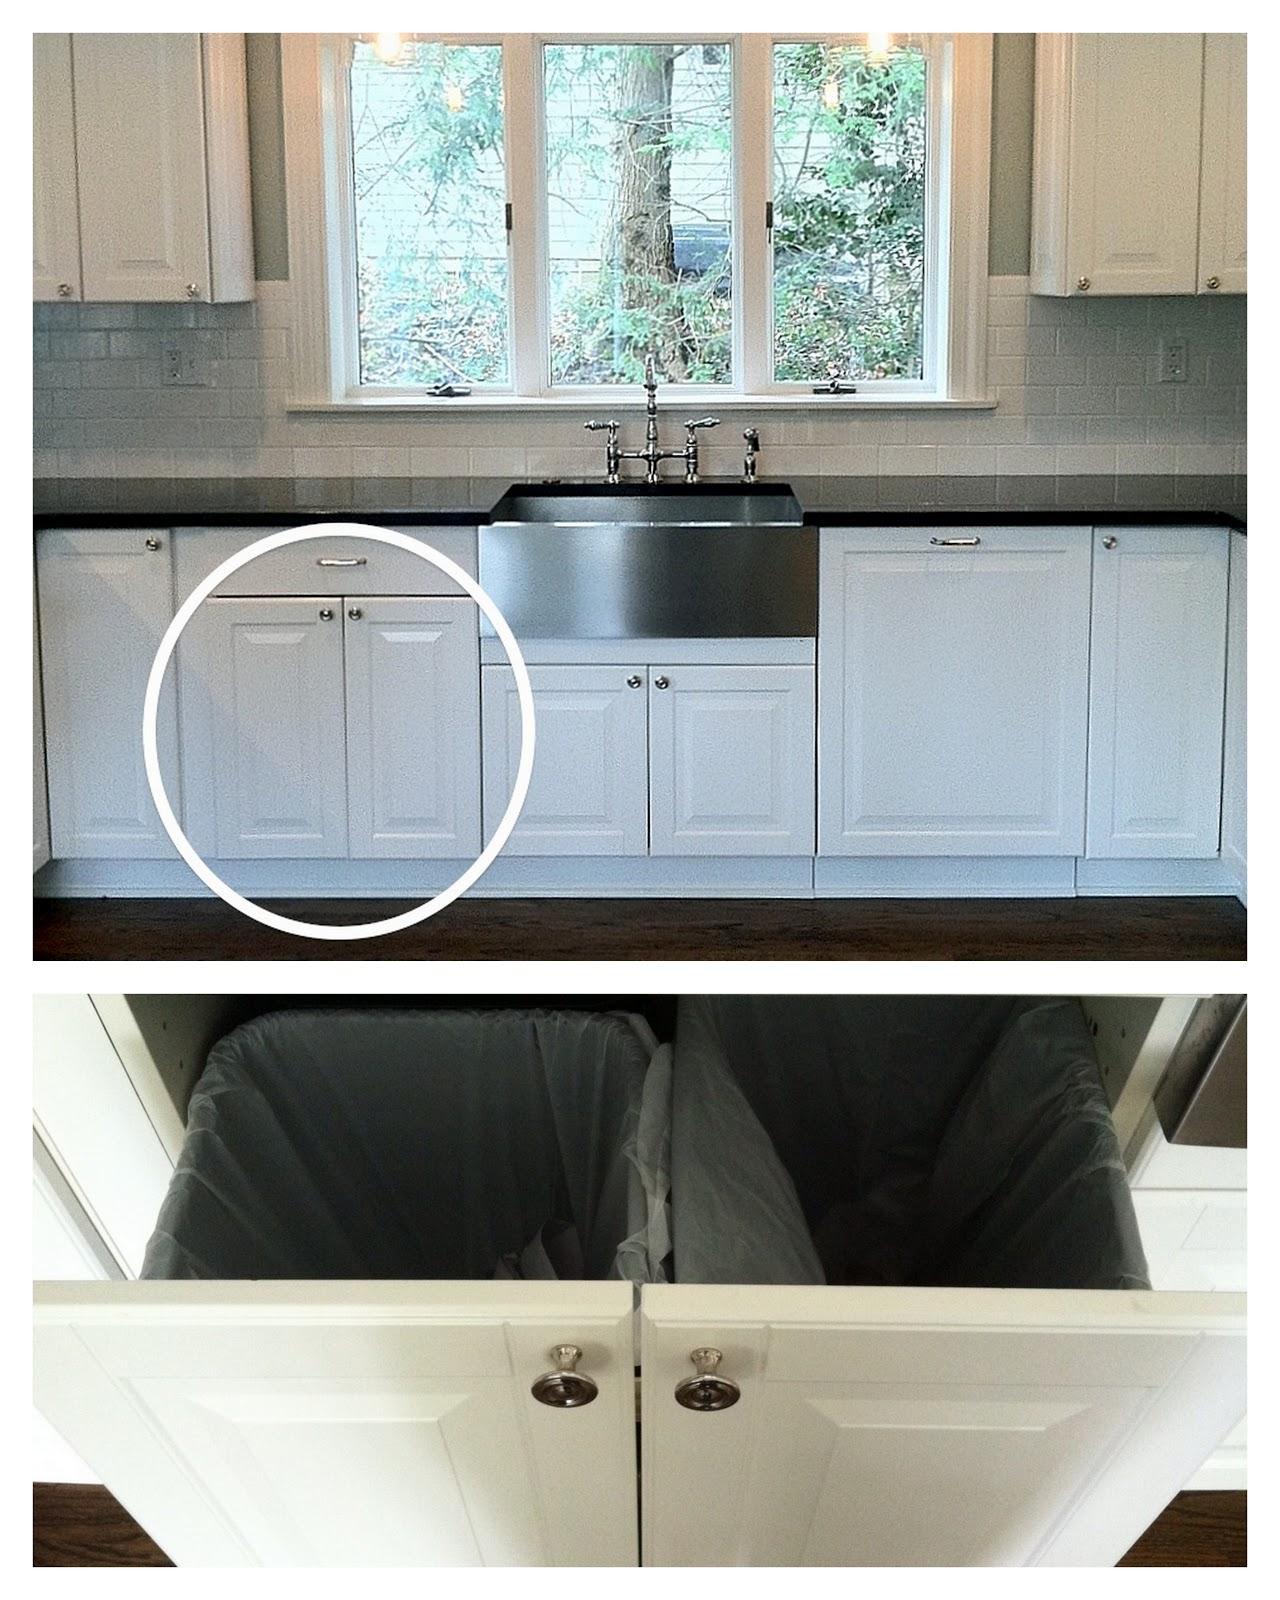 Ikea Kitchen Cabinetry: Haute Indoor Couture: Ikea Kitchen Renovation Part 1